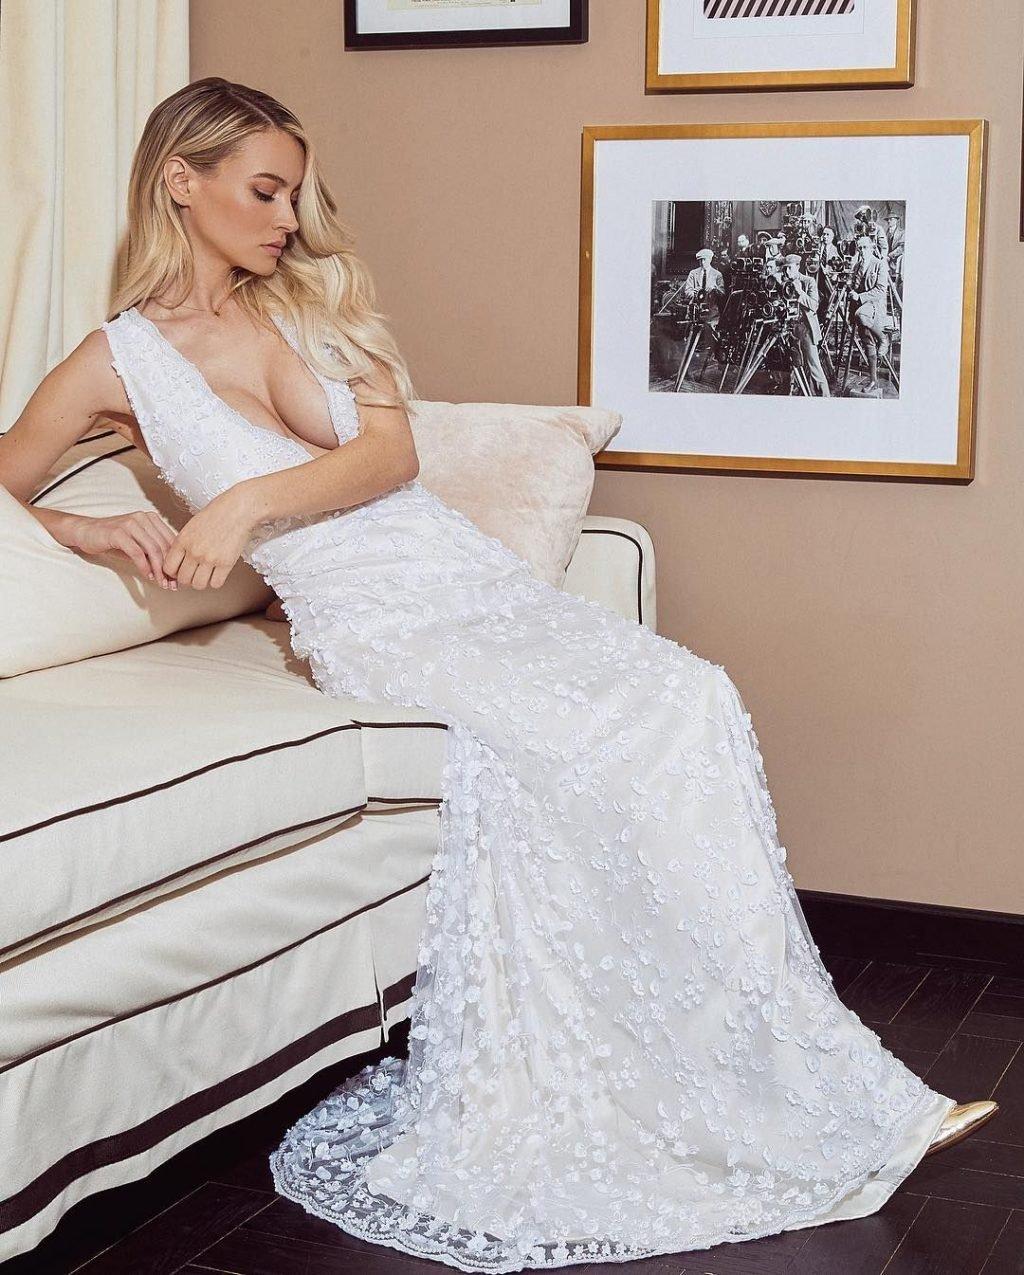 Bryana Holly Sexy (19 Photos)